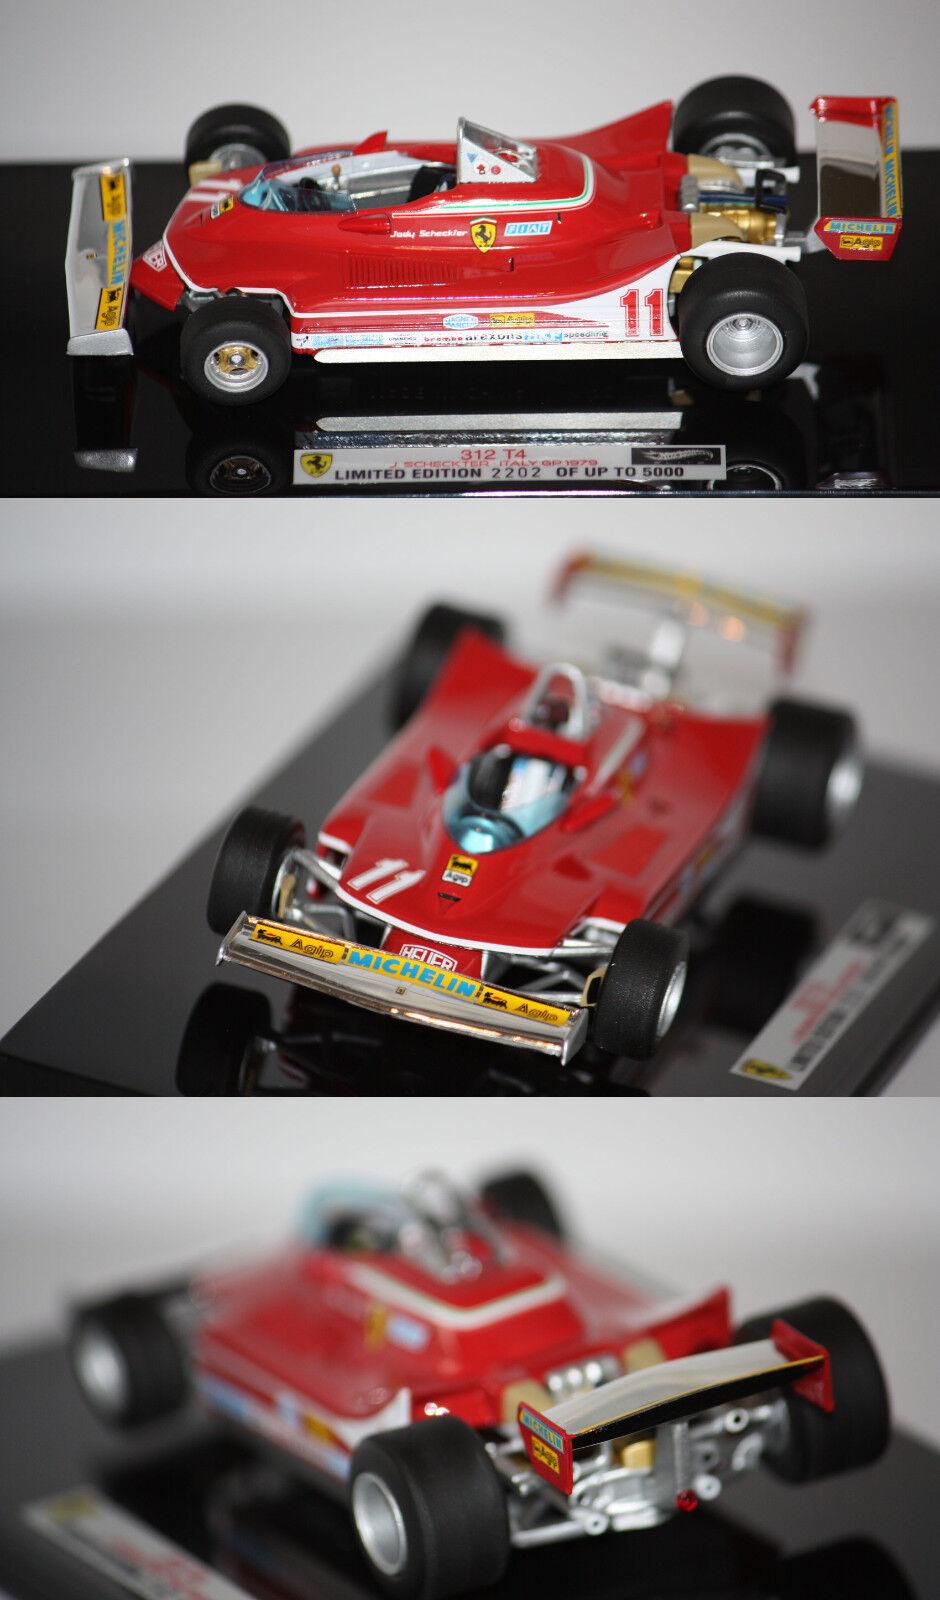 moda Hotwheels Elite Elite Elite F1 Ferrari 312 T4 J. Checkter World Champ. 1979 1 43  V8372  promociones de descuento